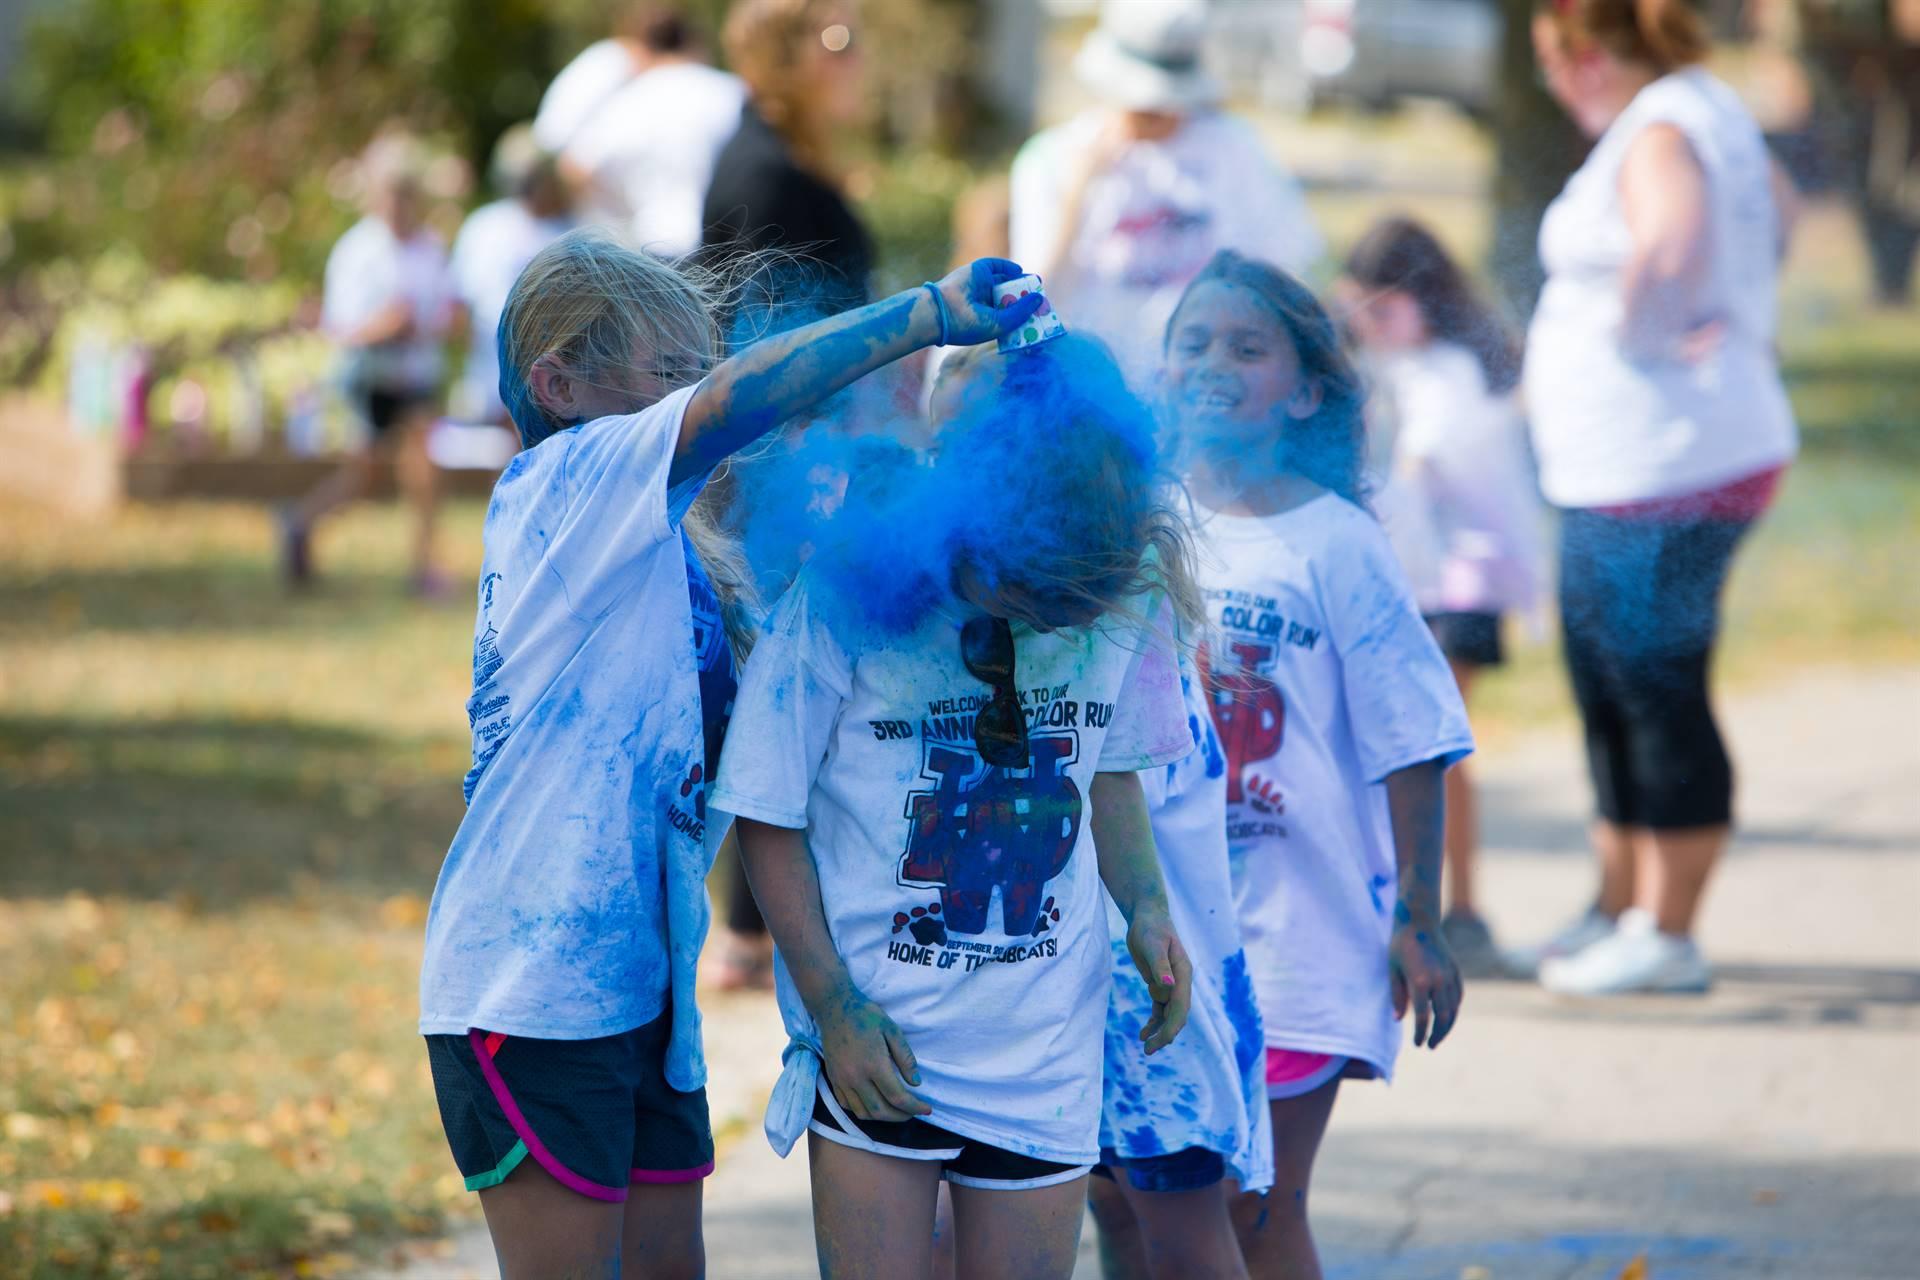 Lots of blue color on kids